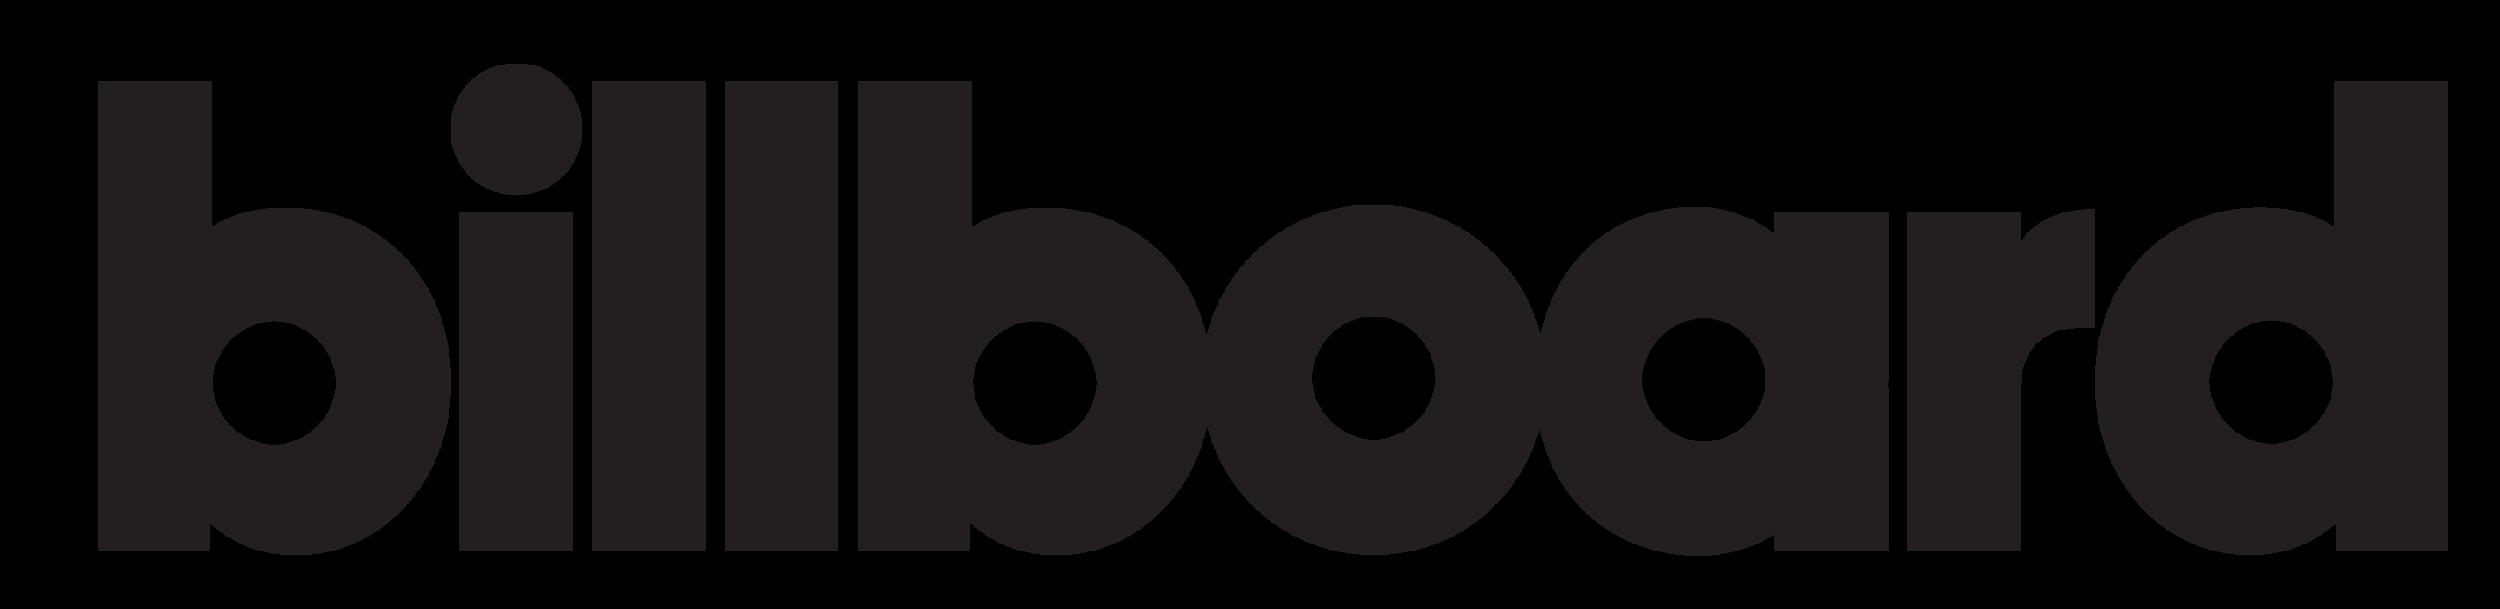 billboard_logo-02.png